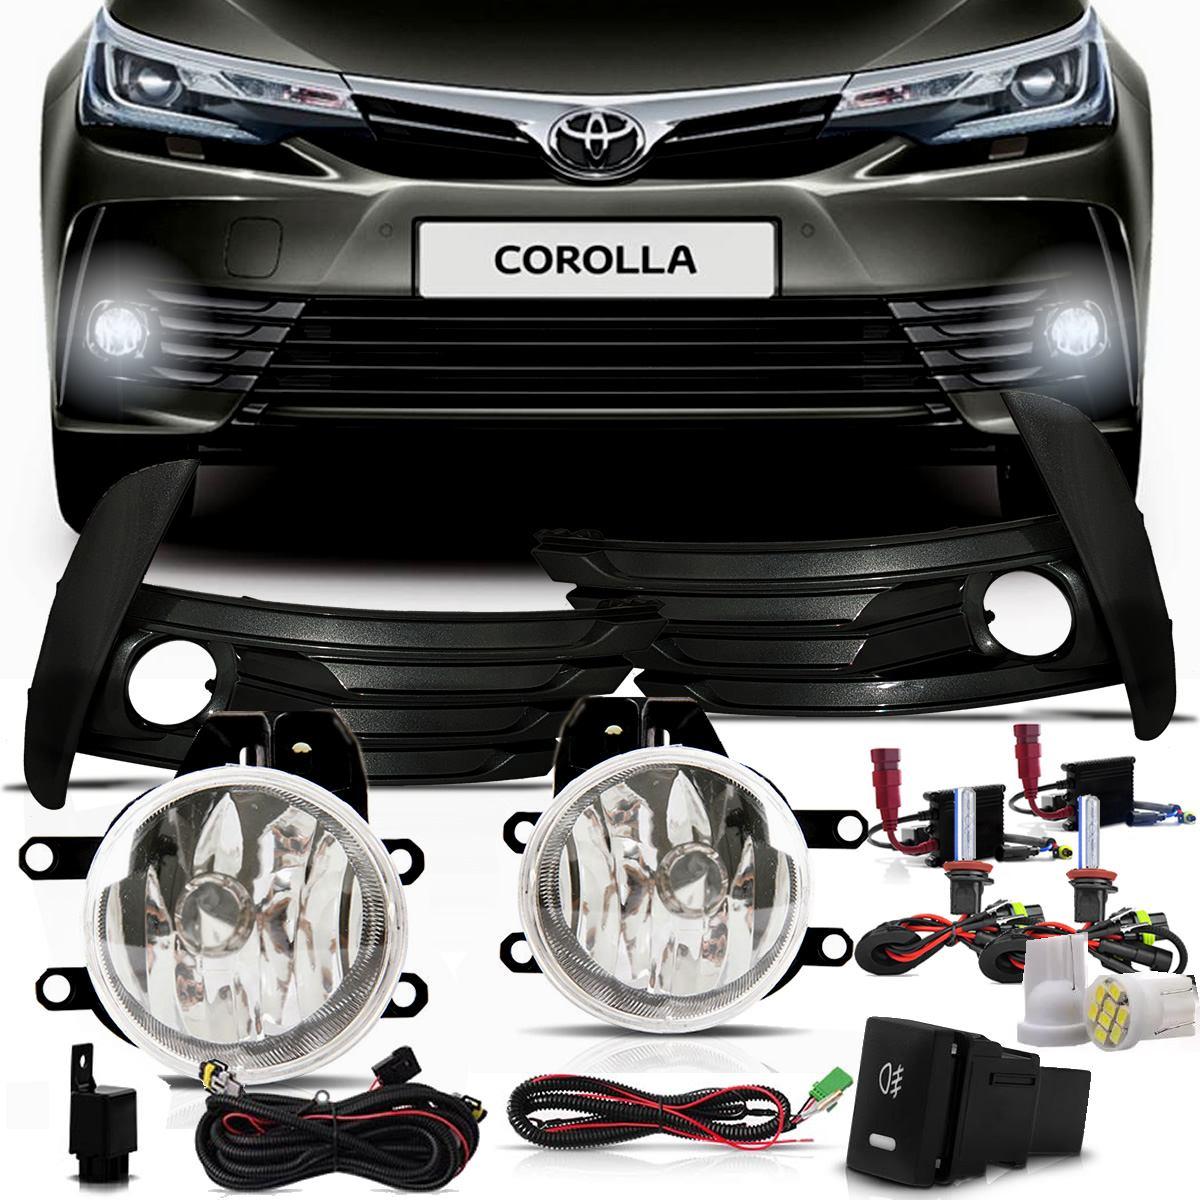 Kit Farol de Milha Neblina Toyota Corolla 2017a 2019 + Molduras Grafite